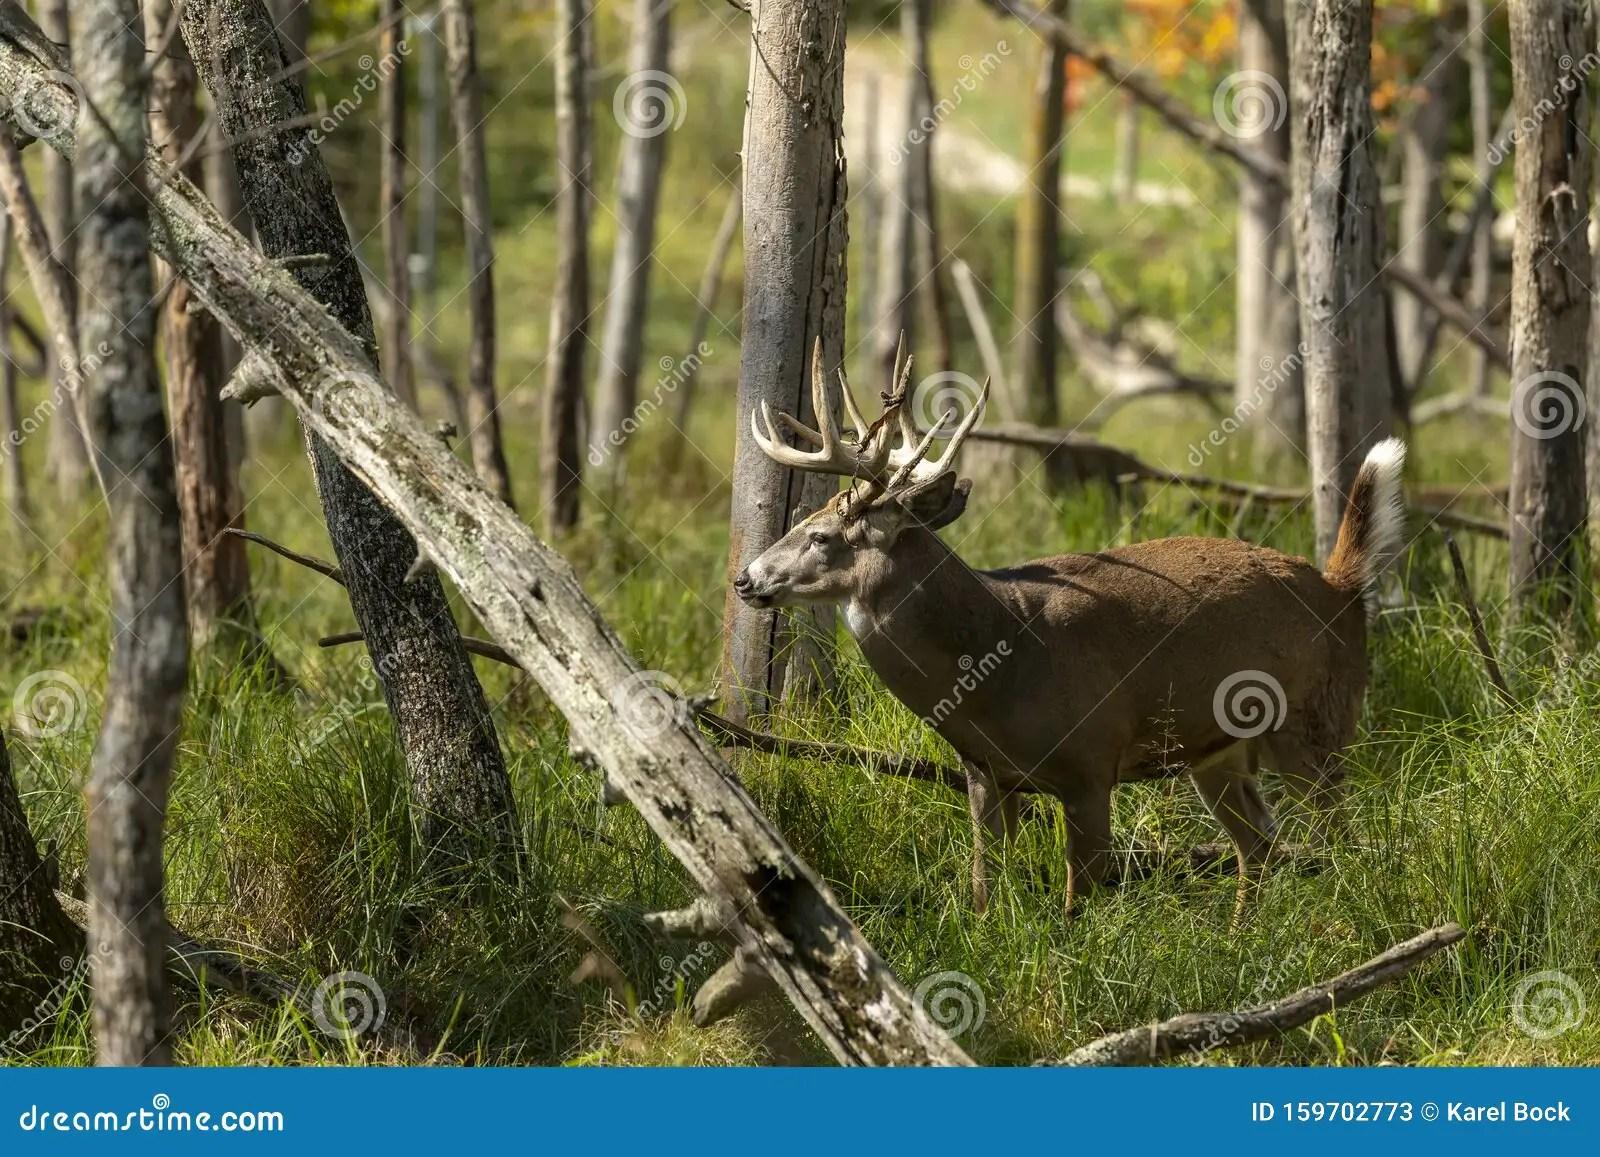 White Tailed Deer In Natural Habitat Stock Image